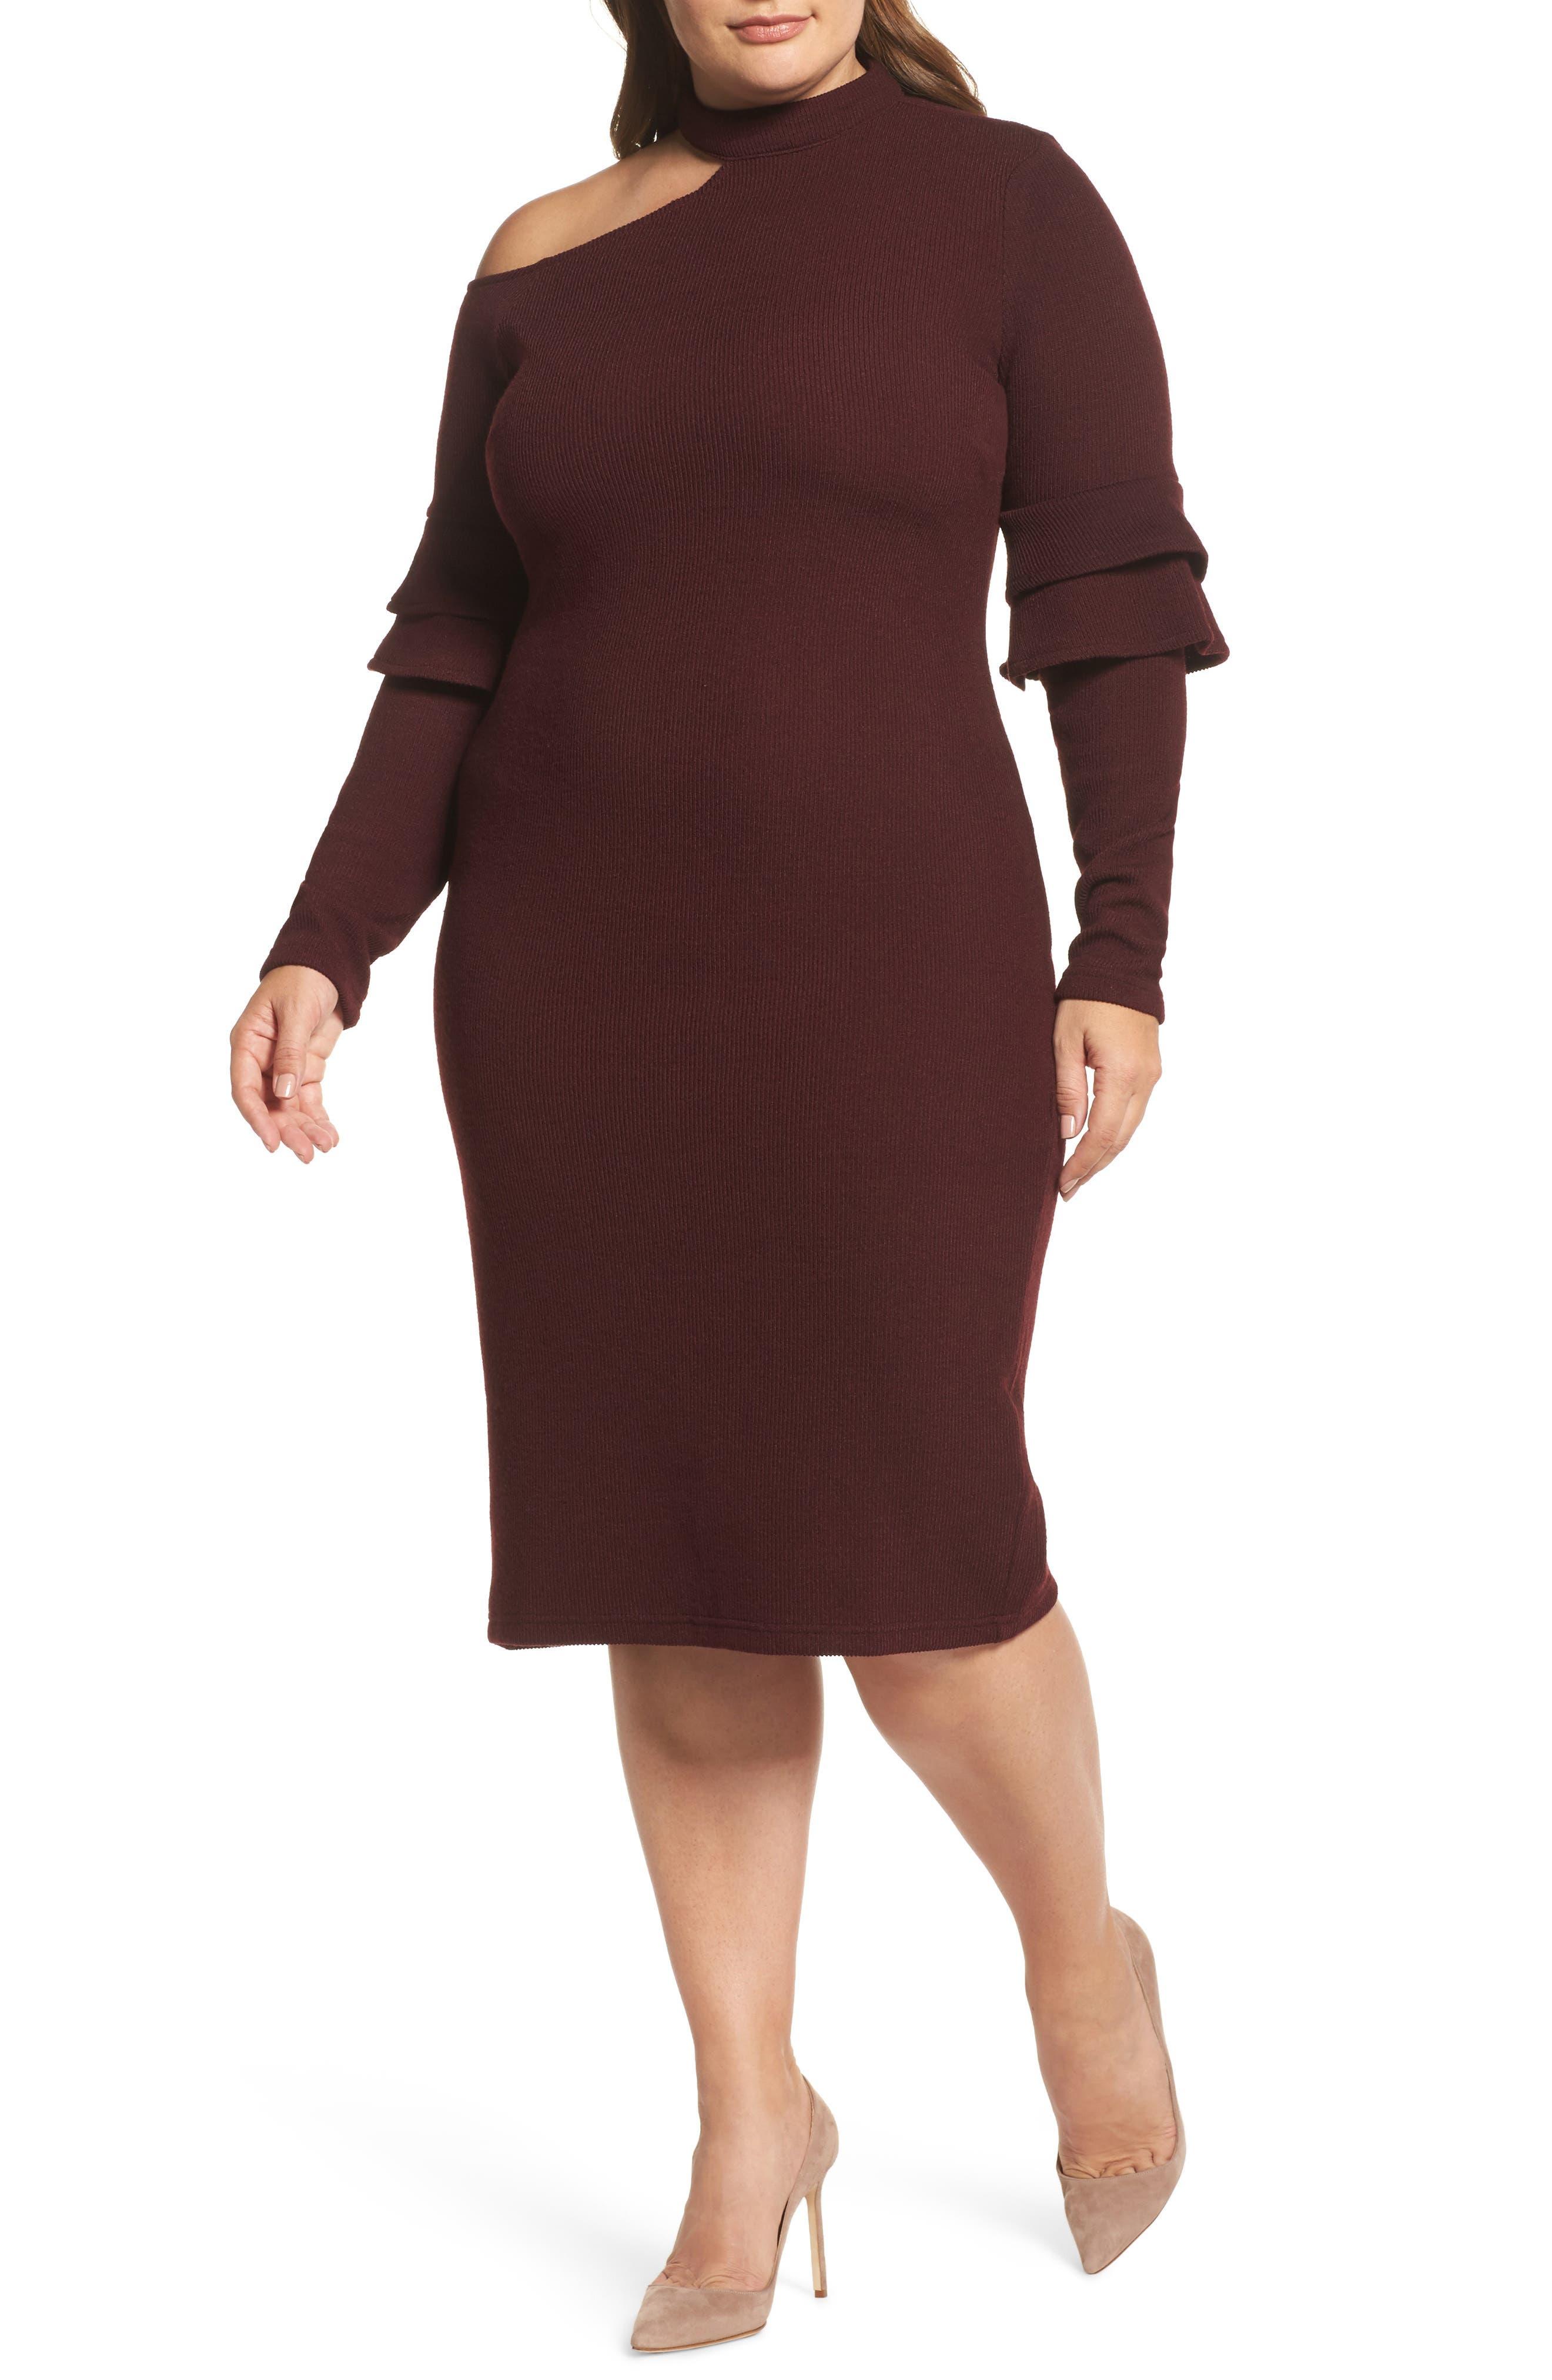 Alternate Image 1 Selected - LOST INK Shoulder Cutout Knit Dress (Plus Size)